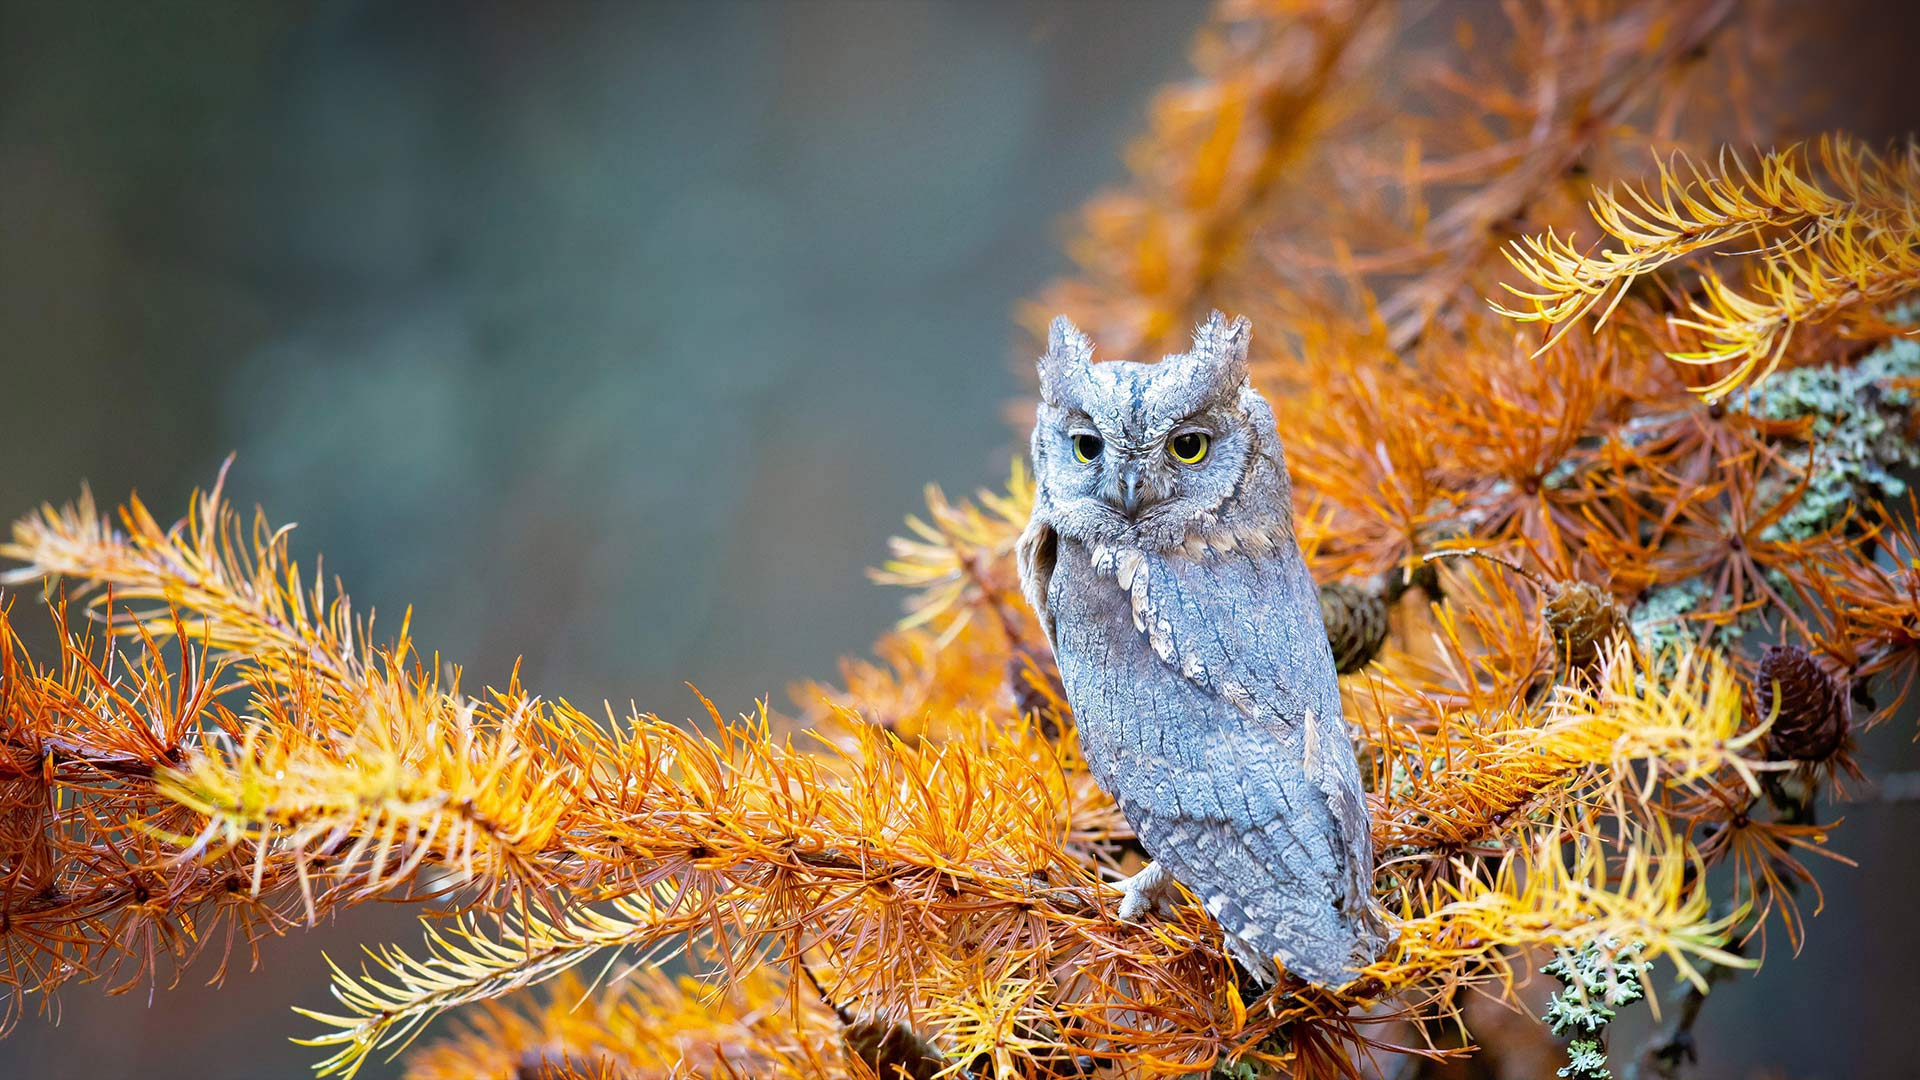 Eurasian scops owl in Bohemian Switzerland National Park, Czech Republic (© Milan Zygmunt/Alamy)